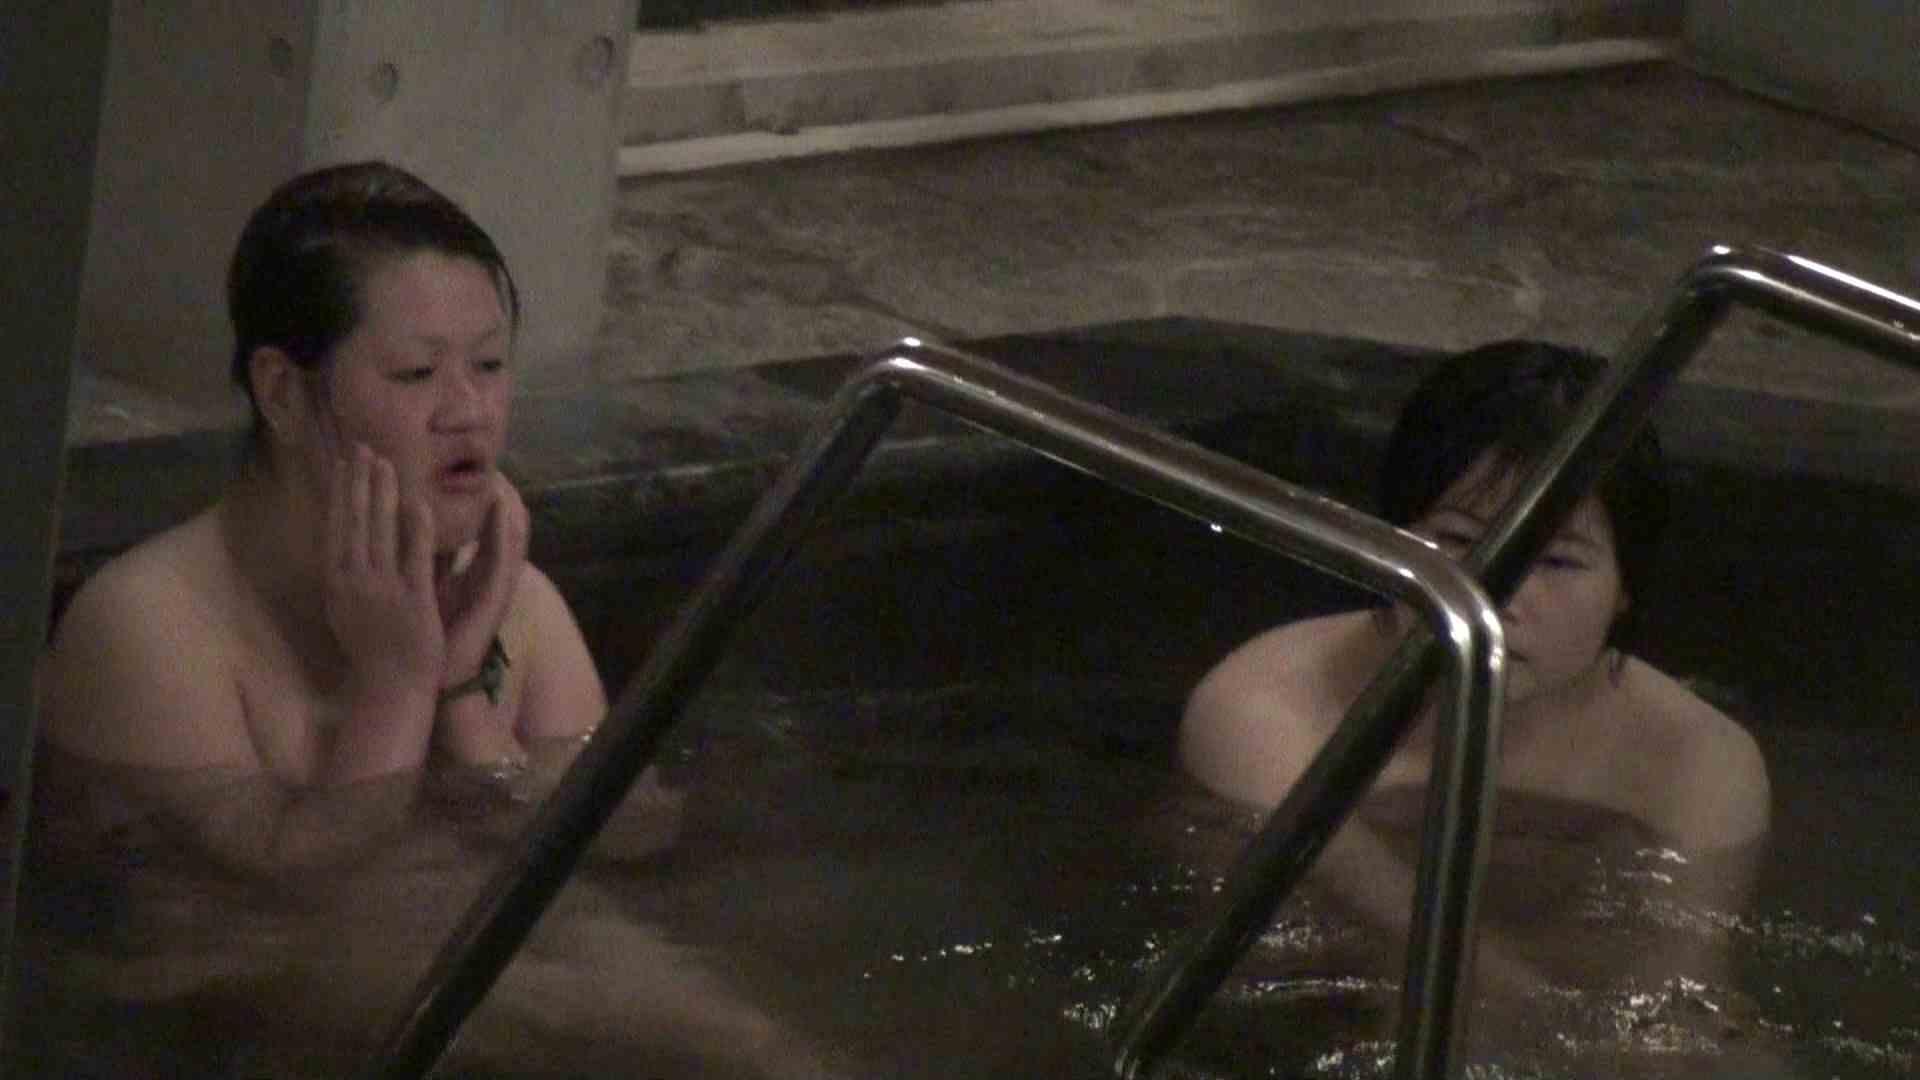 Aquaな露天風呂Vol.384 盗撮シリーズ | 露天風呂編  113PIX 101